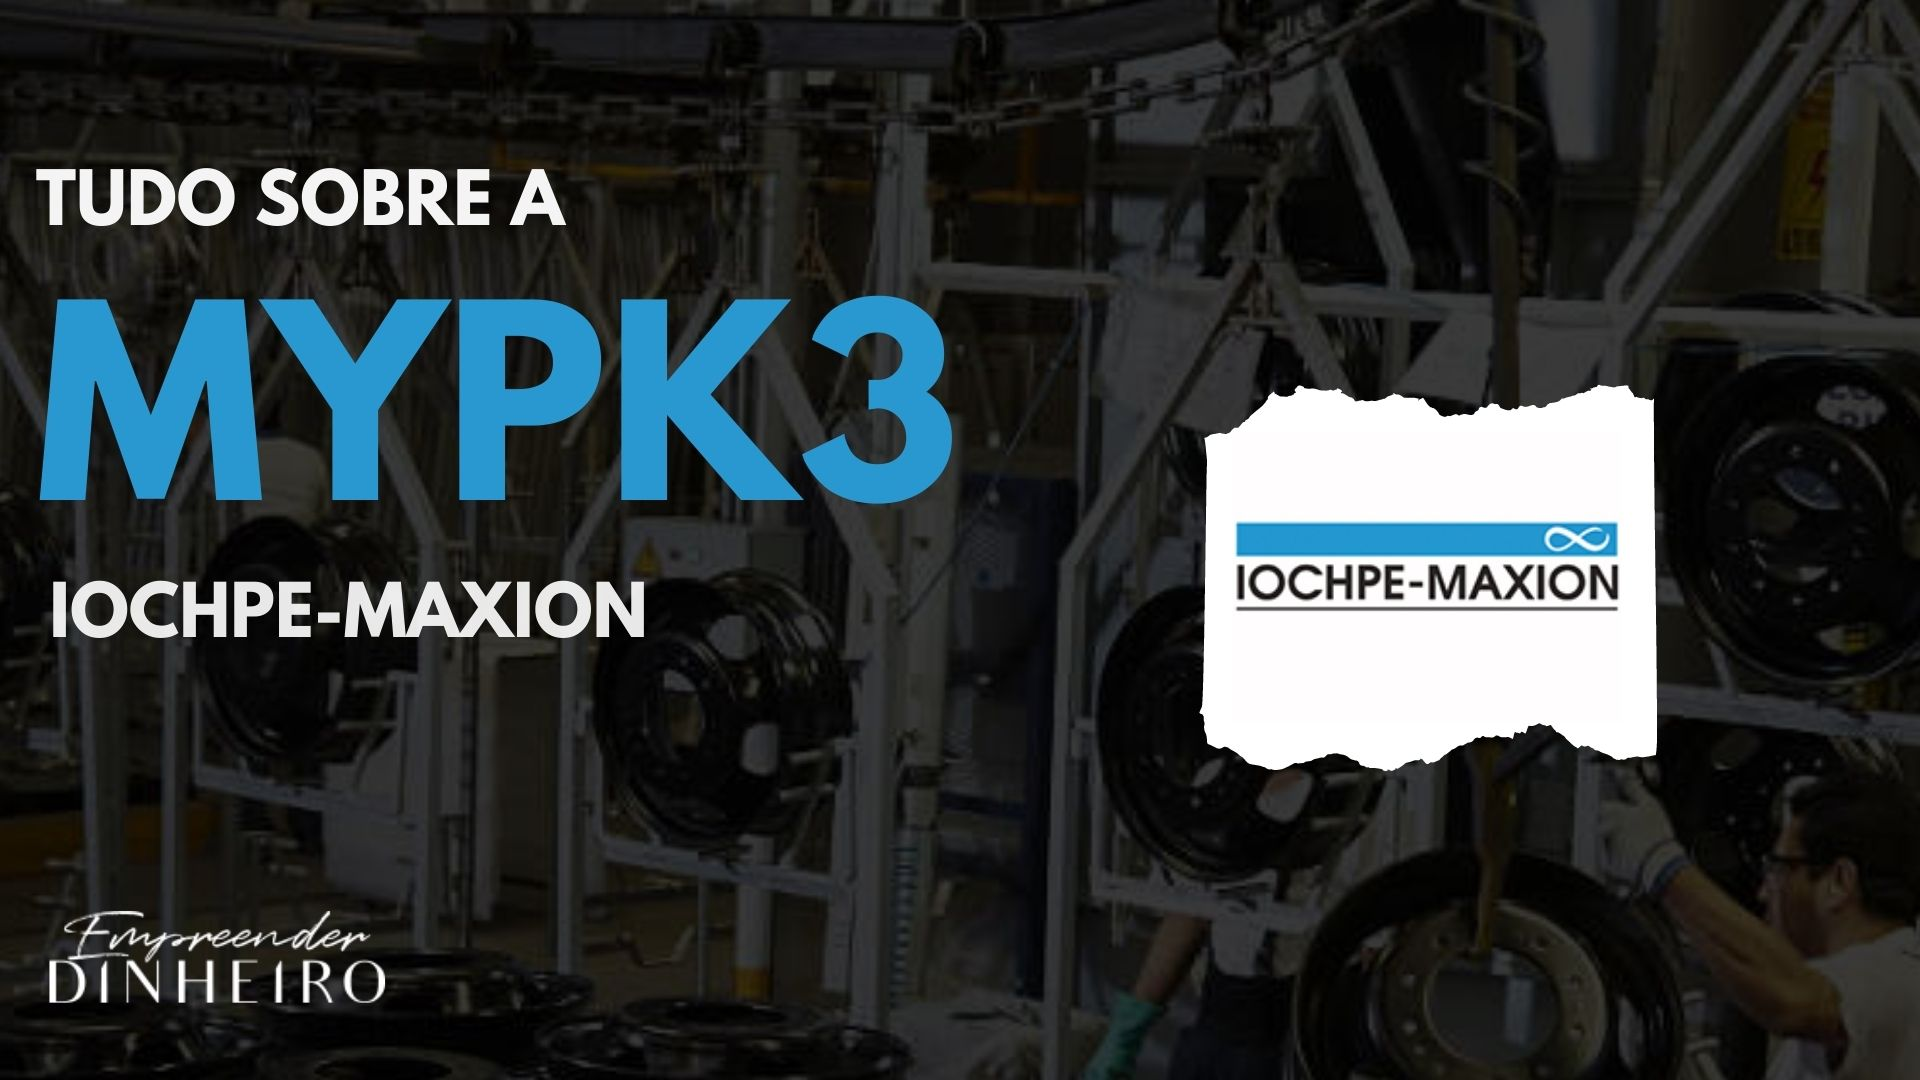 MYPK3